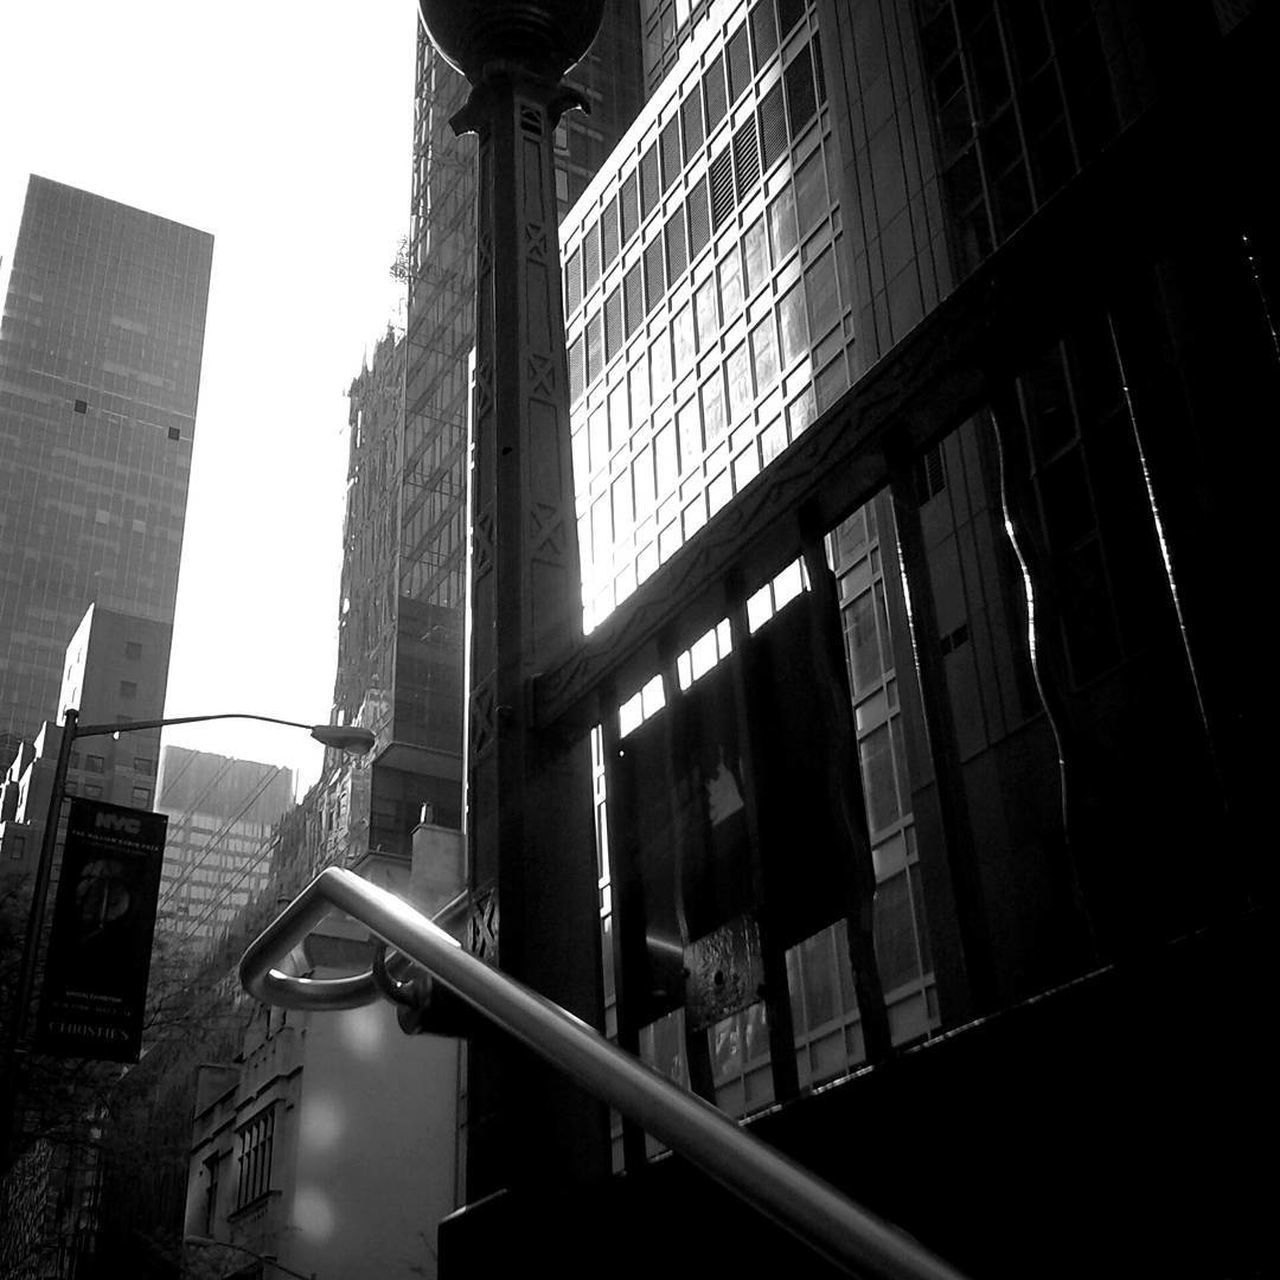 Manhattan Undergroundstation Subway Subway Station New York Big Apple Newyorkstreet NYC NYC Photography New York City Urbanlife Black & White Urbanexploration My Year My View Urban Exploration USA United States Minimalist Architecture Minimalist Architecture Welcome To Black Art Is Everywhere The Architect - 2017 EyeEm Awards